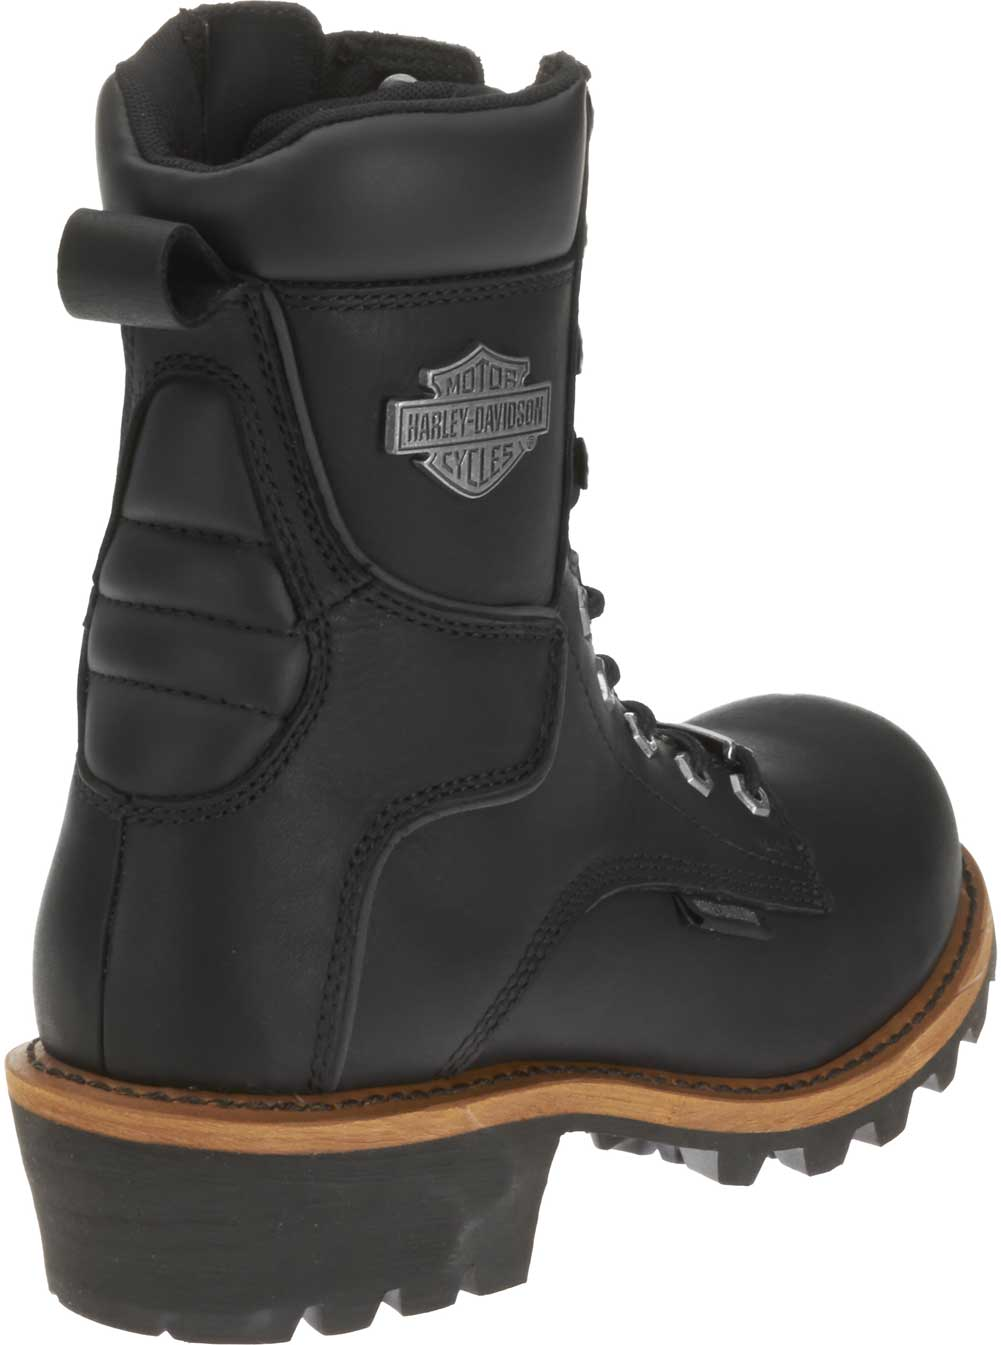 Harley Davidson Men S Tyson Logger Black 7 5 Inch